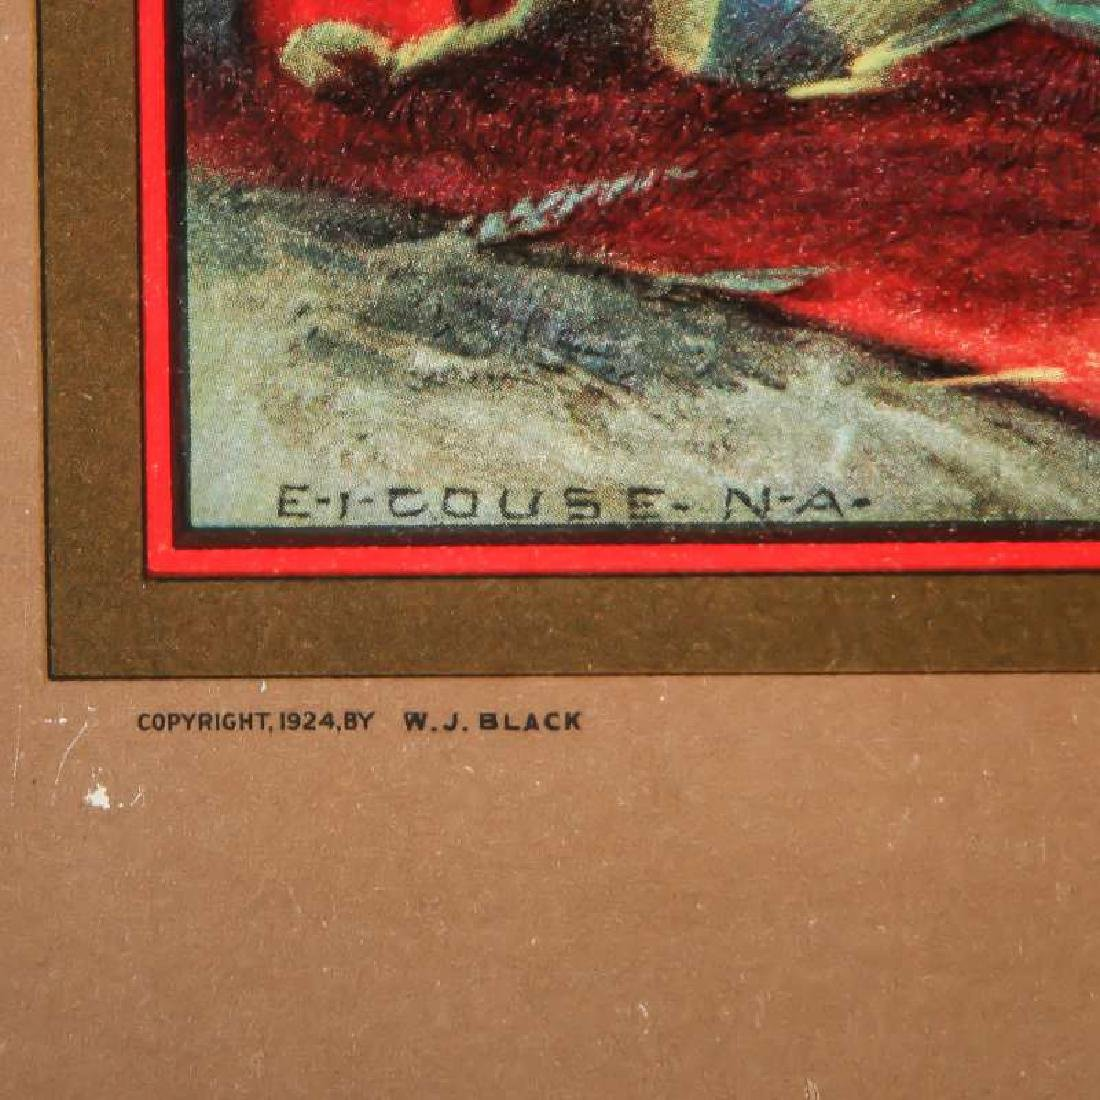 1925 SANTA FE RR E.I. COUSE CALENDAR WITH FULL PAD - 4